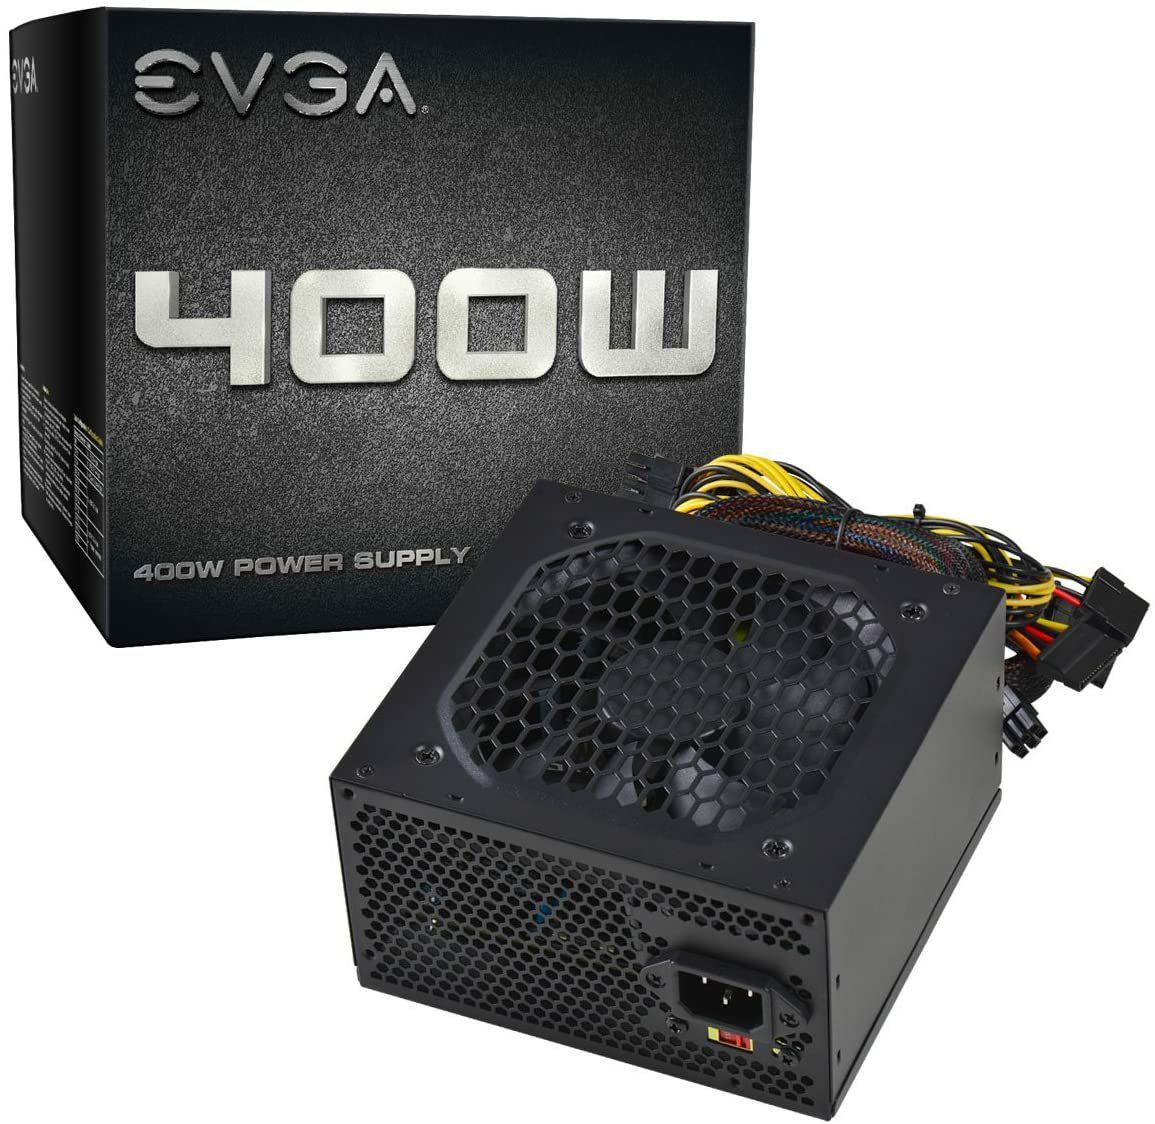 Amazon: EVGA 400W Fuente de poder 100-N1-0400-L1 224